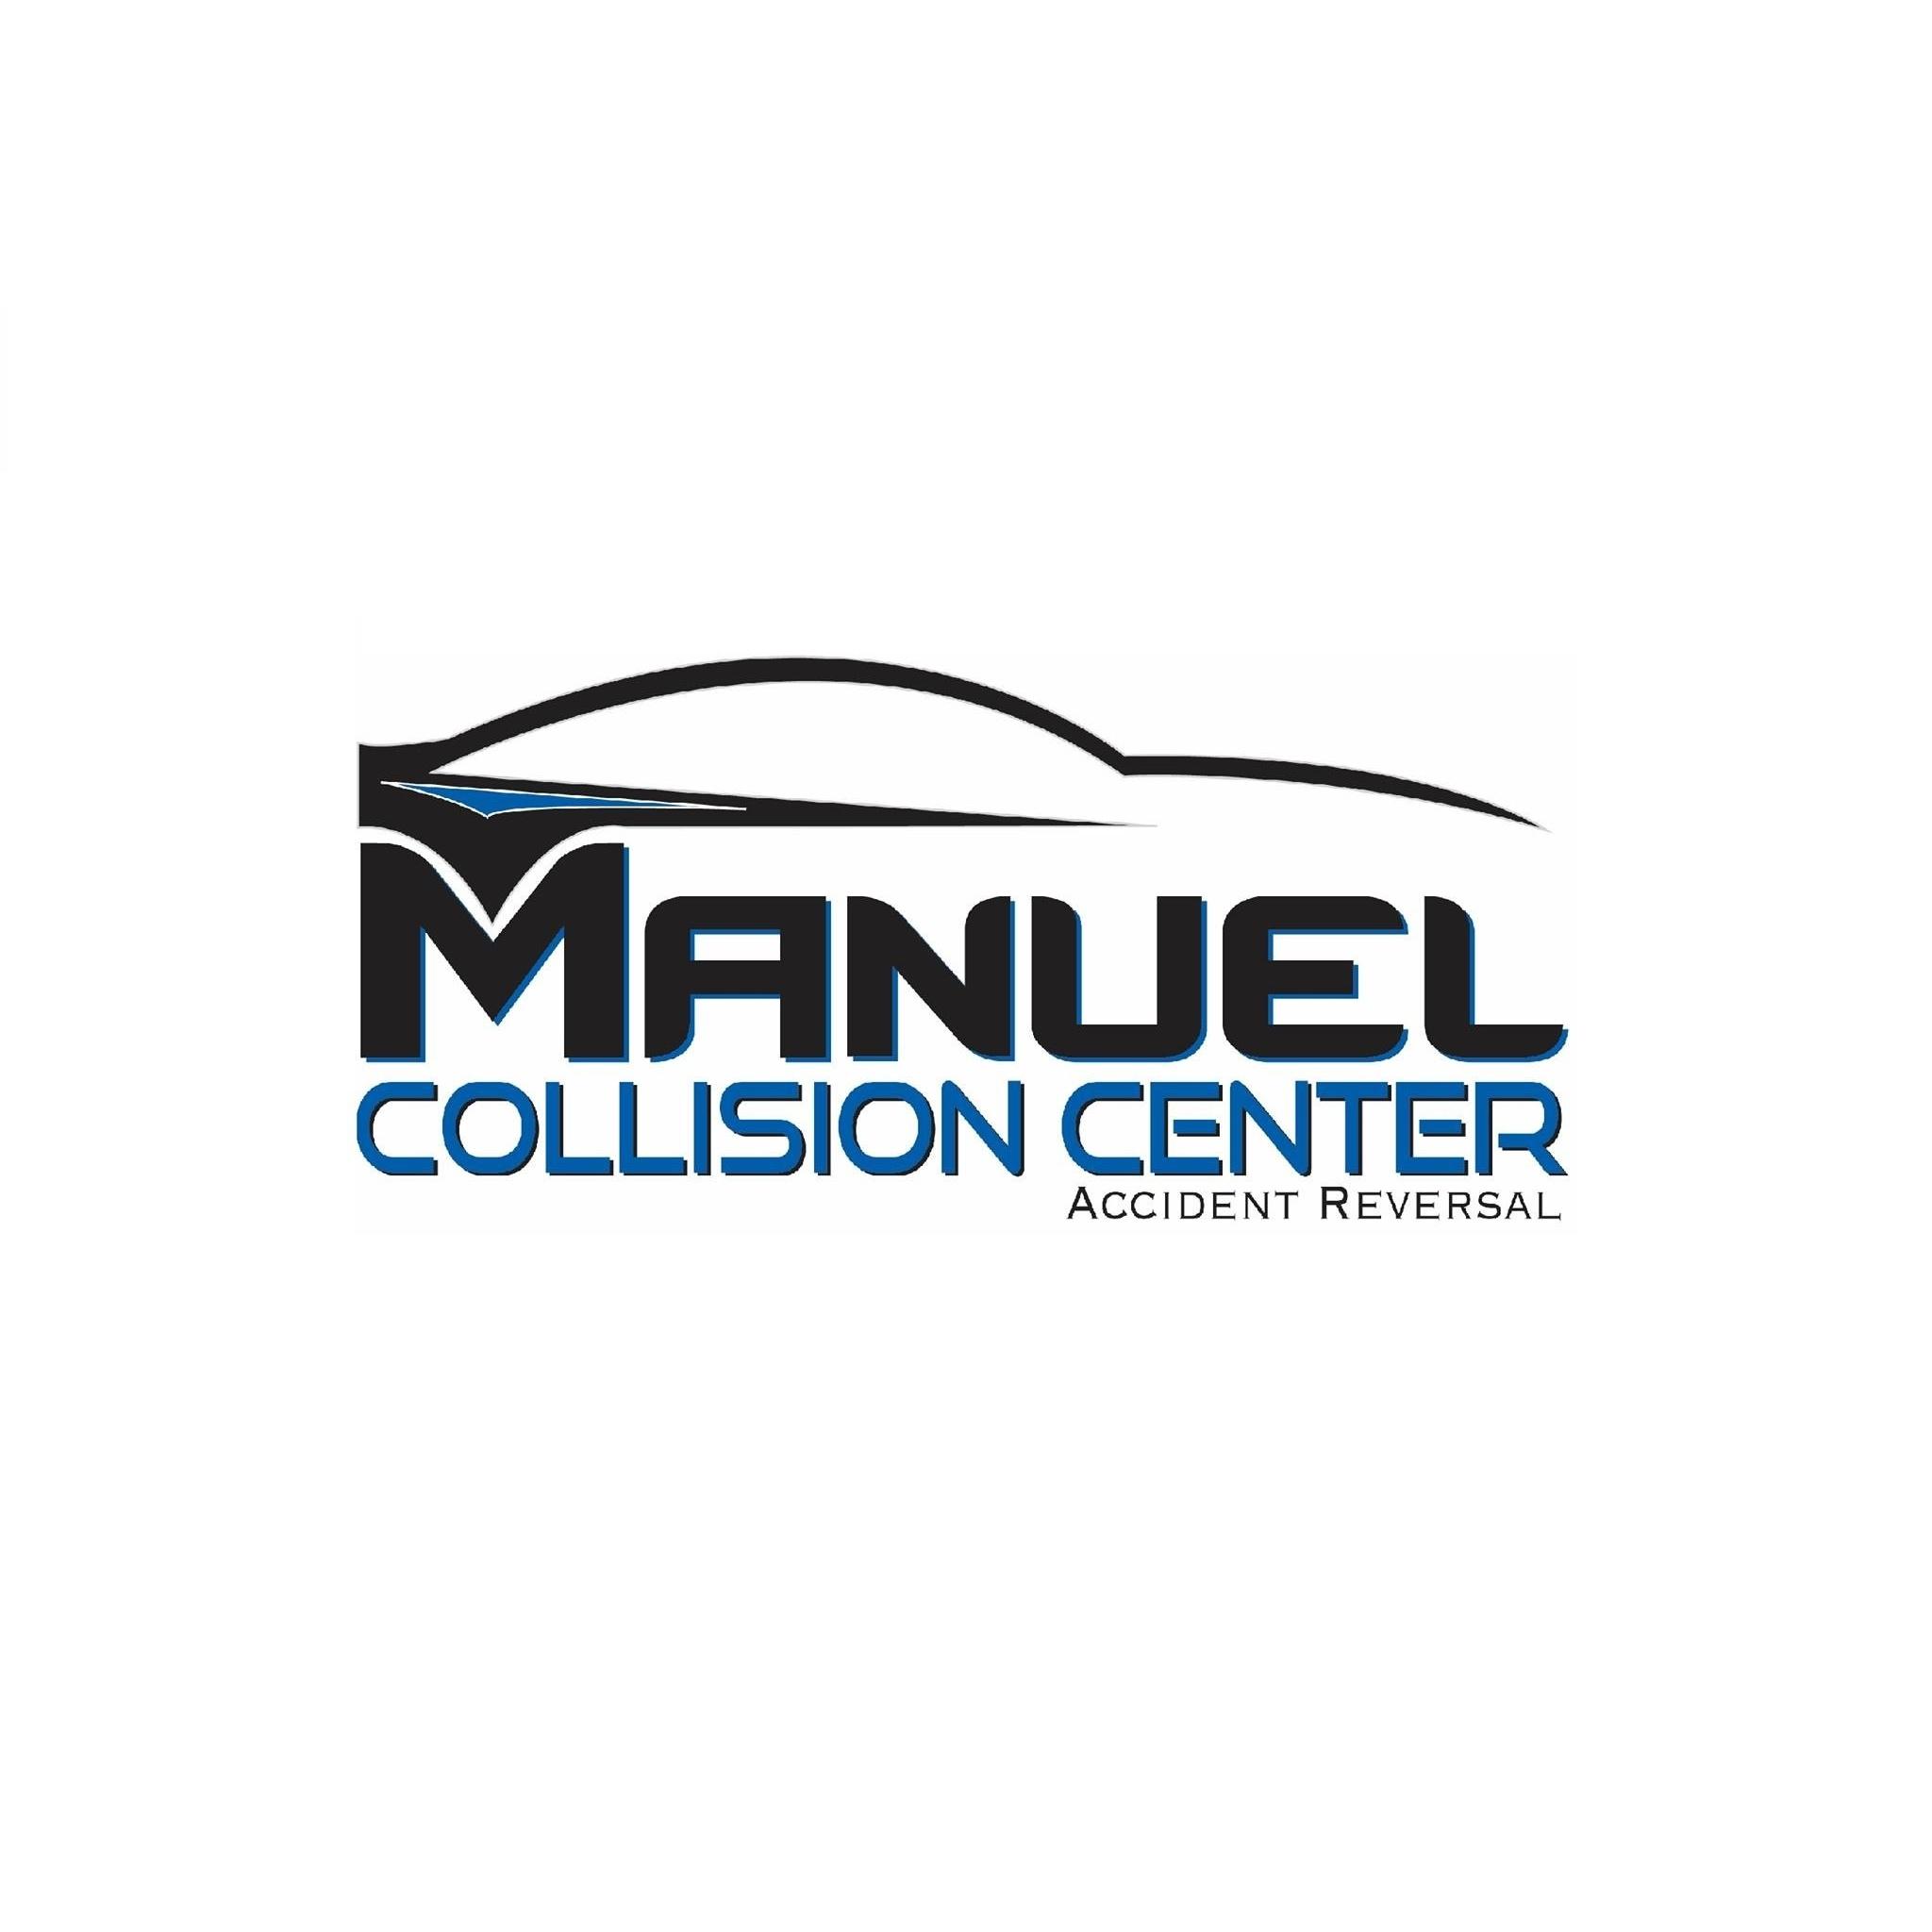 Manuel Collision Center